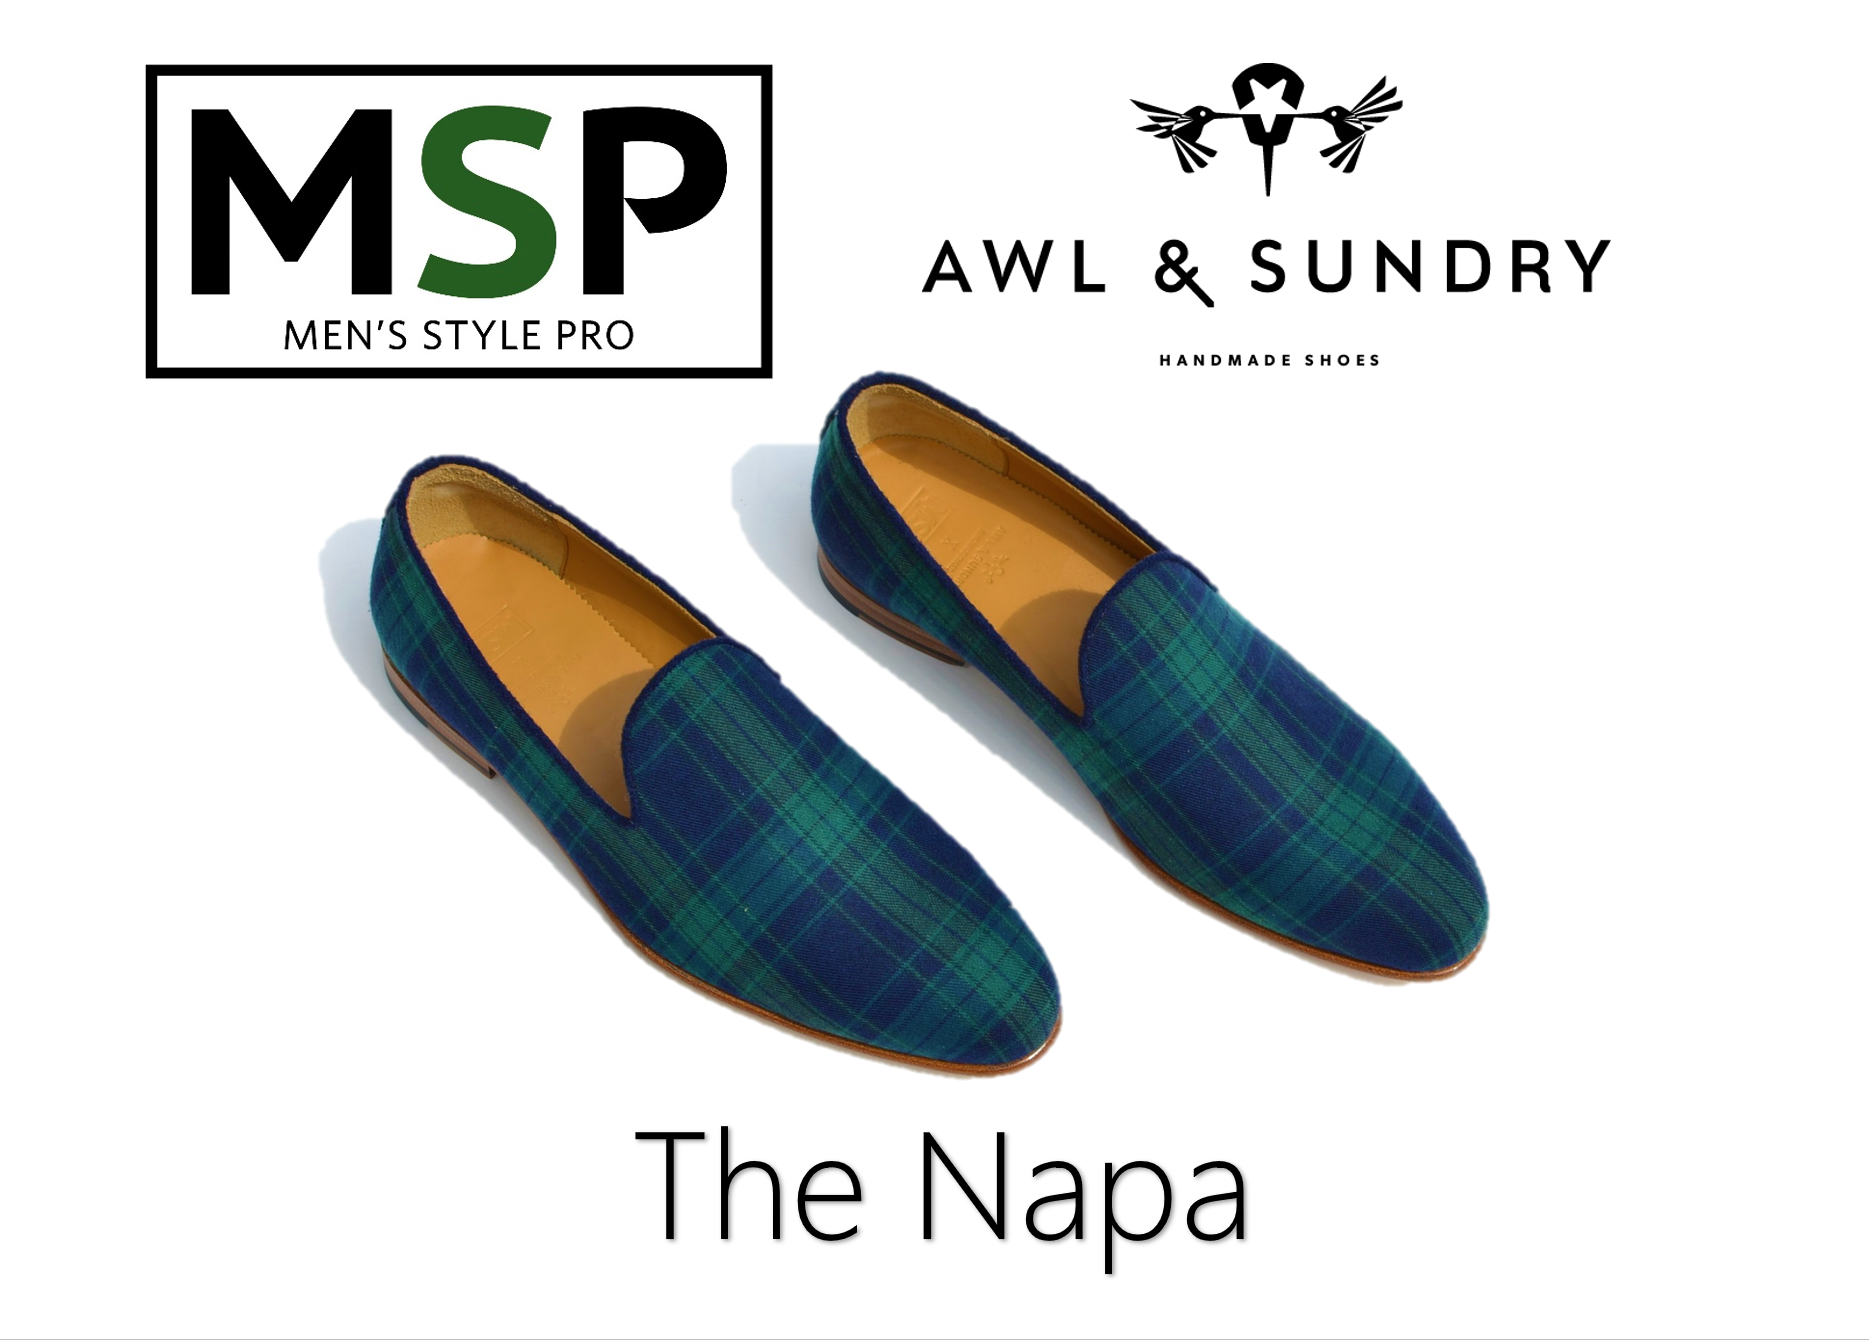 MSP x AS The Napa Slipper Aerial